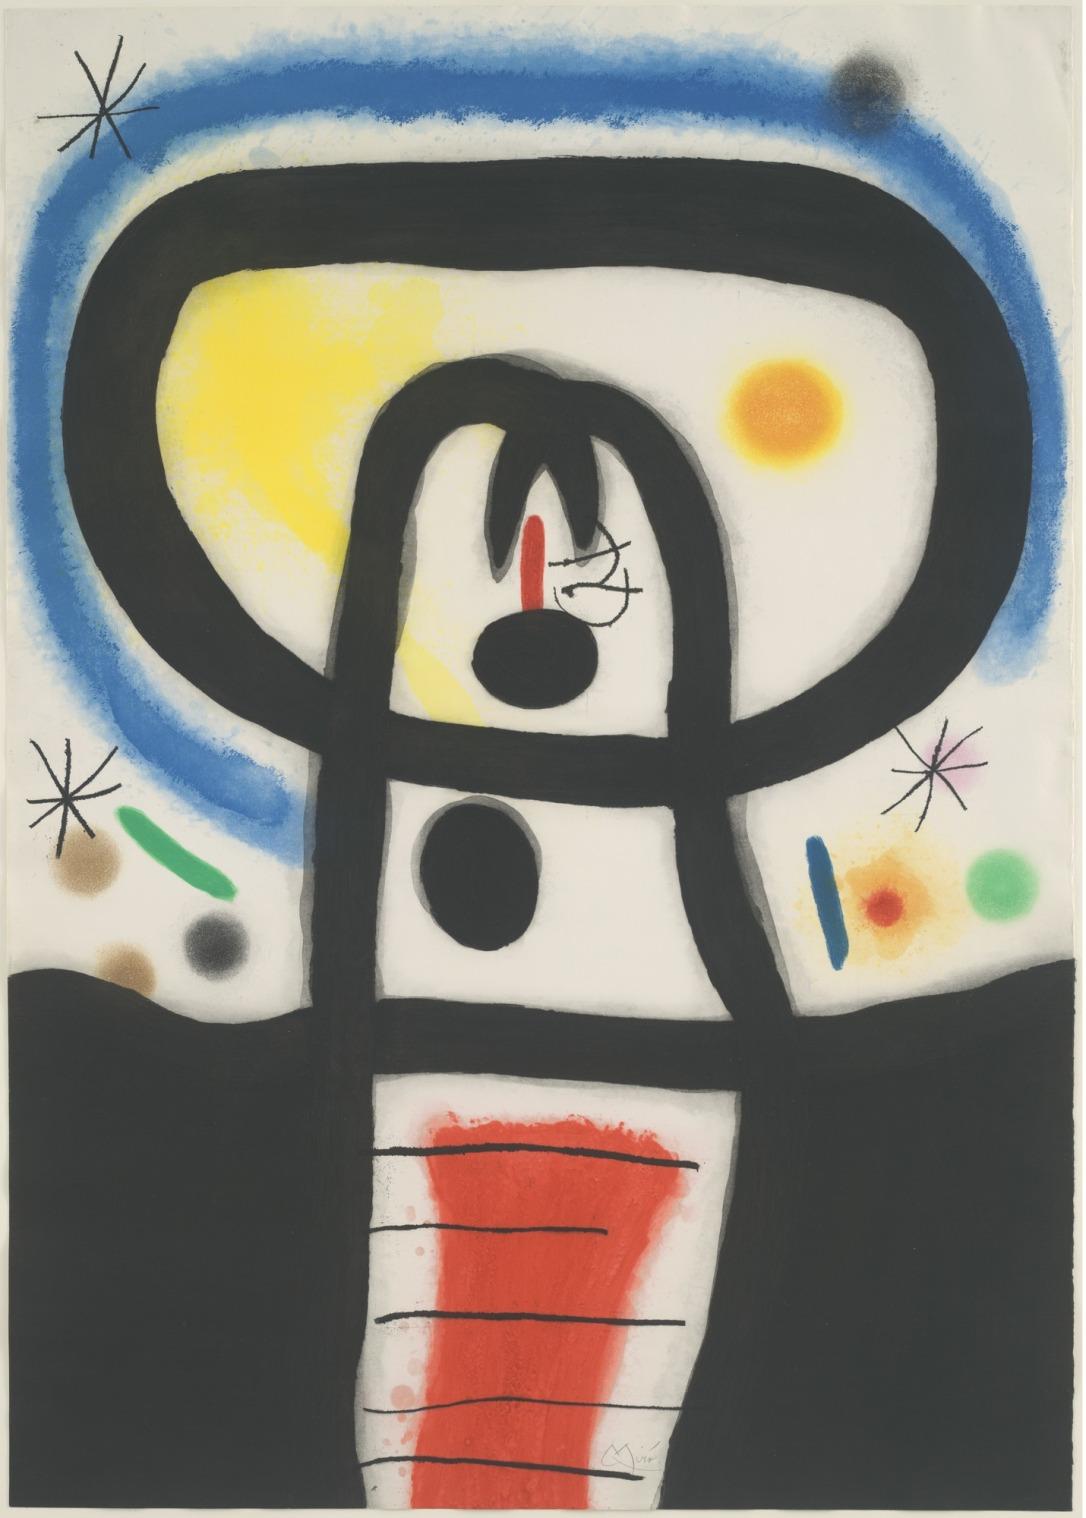 Joan Miró - Equinox